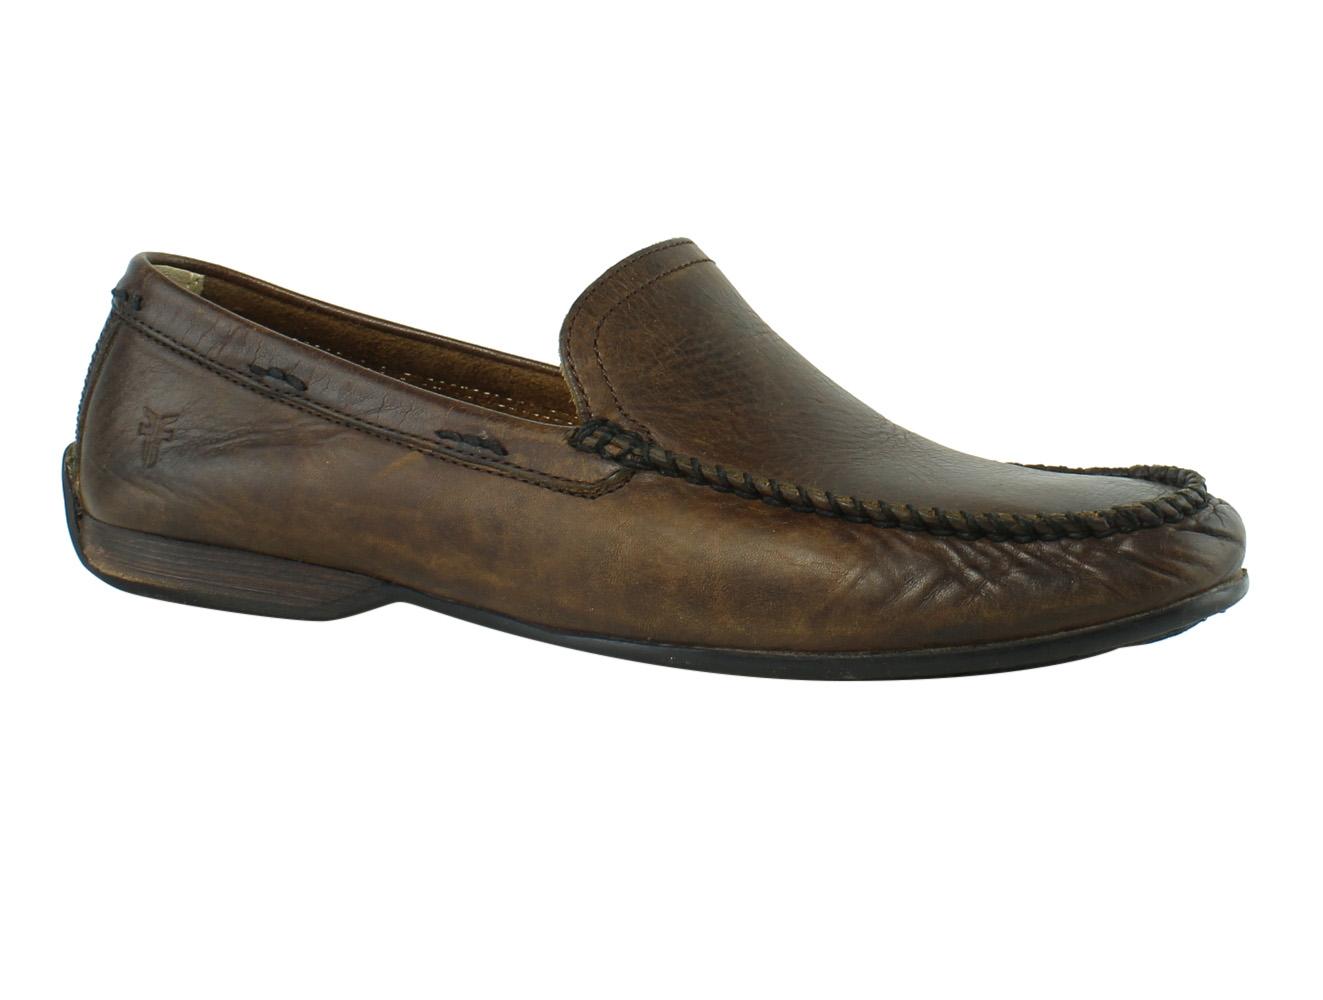 Hombre Lewis Venetian Slip-On Tan 10 M US dIAXFtGkj